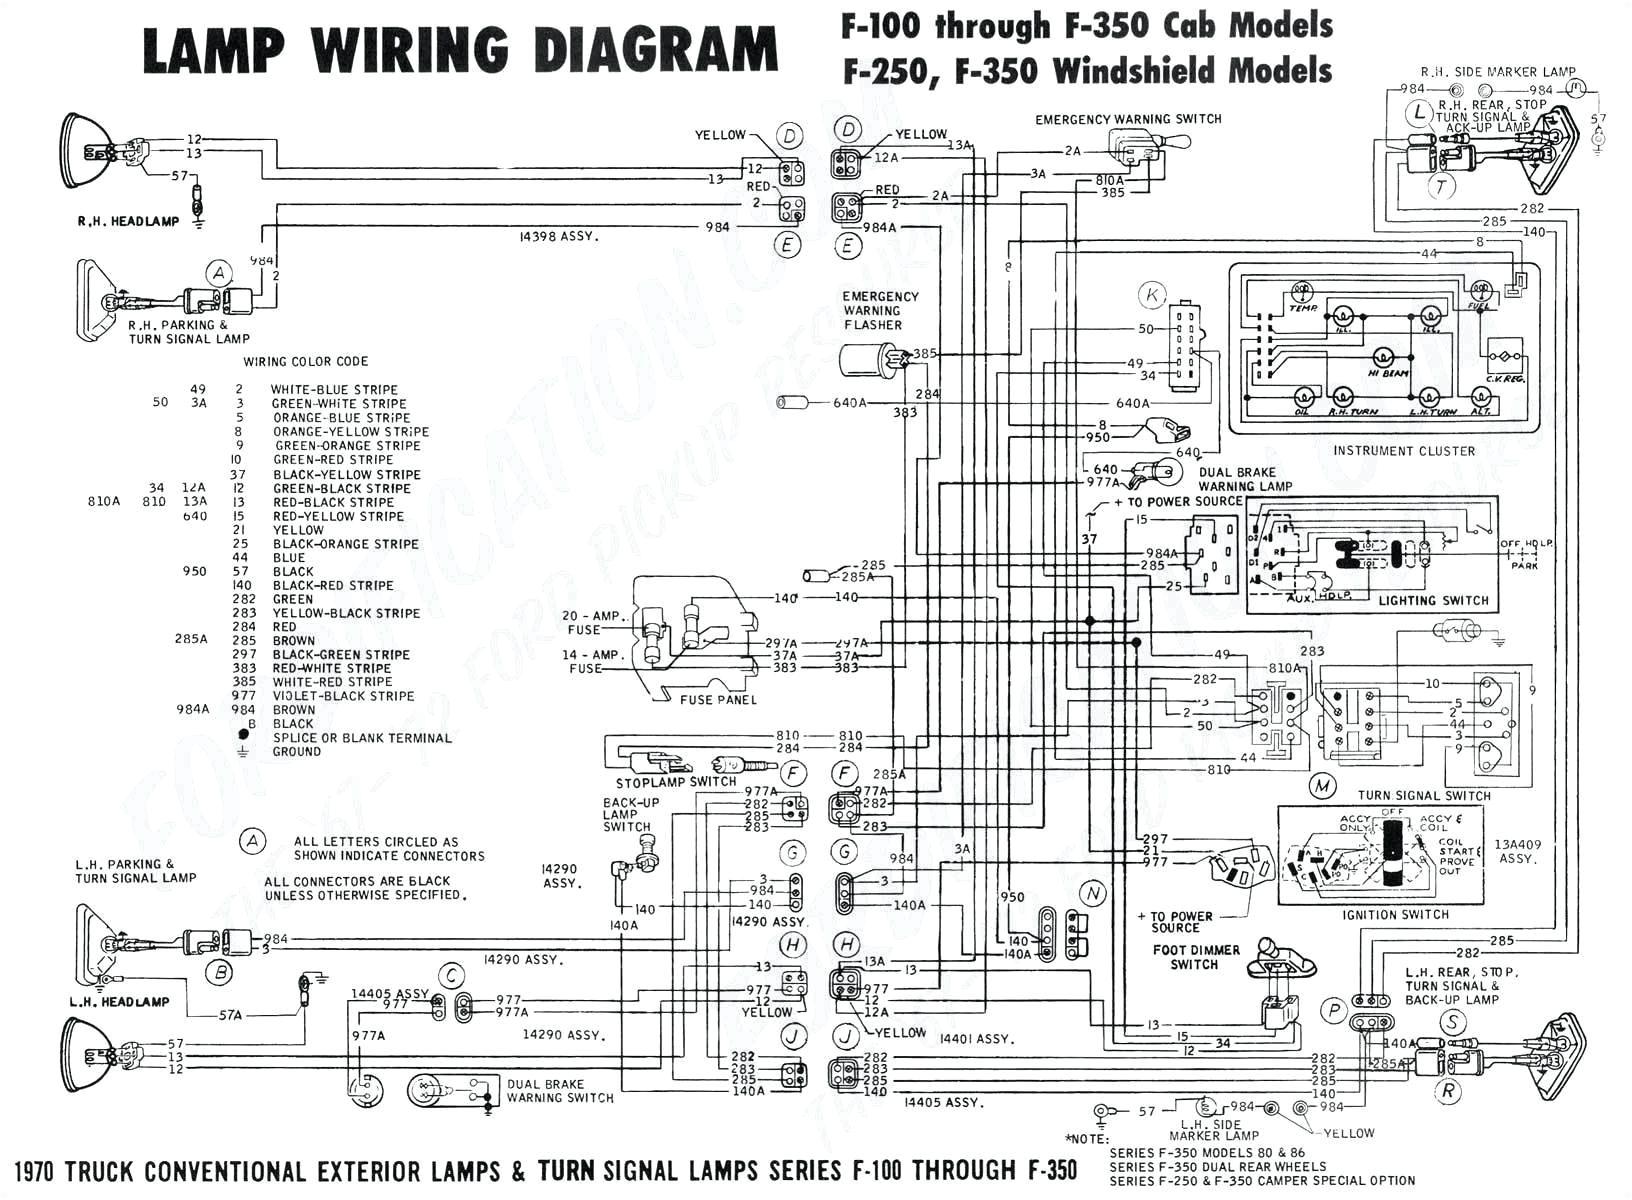 Jeep Commander Trailer Wiring Diagram Jeep Kes Diagram Jeep Circuit Diagrams Blog Wiring Diagram